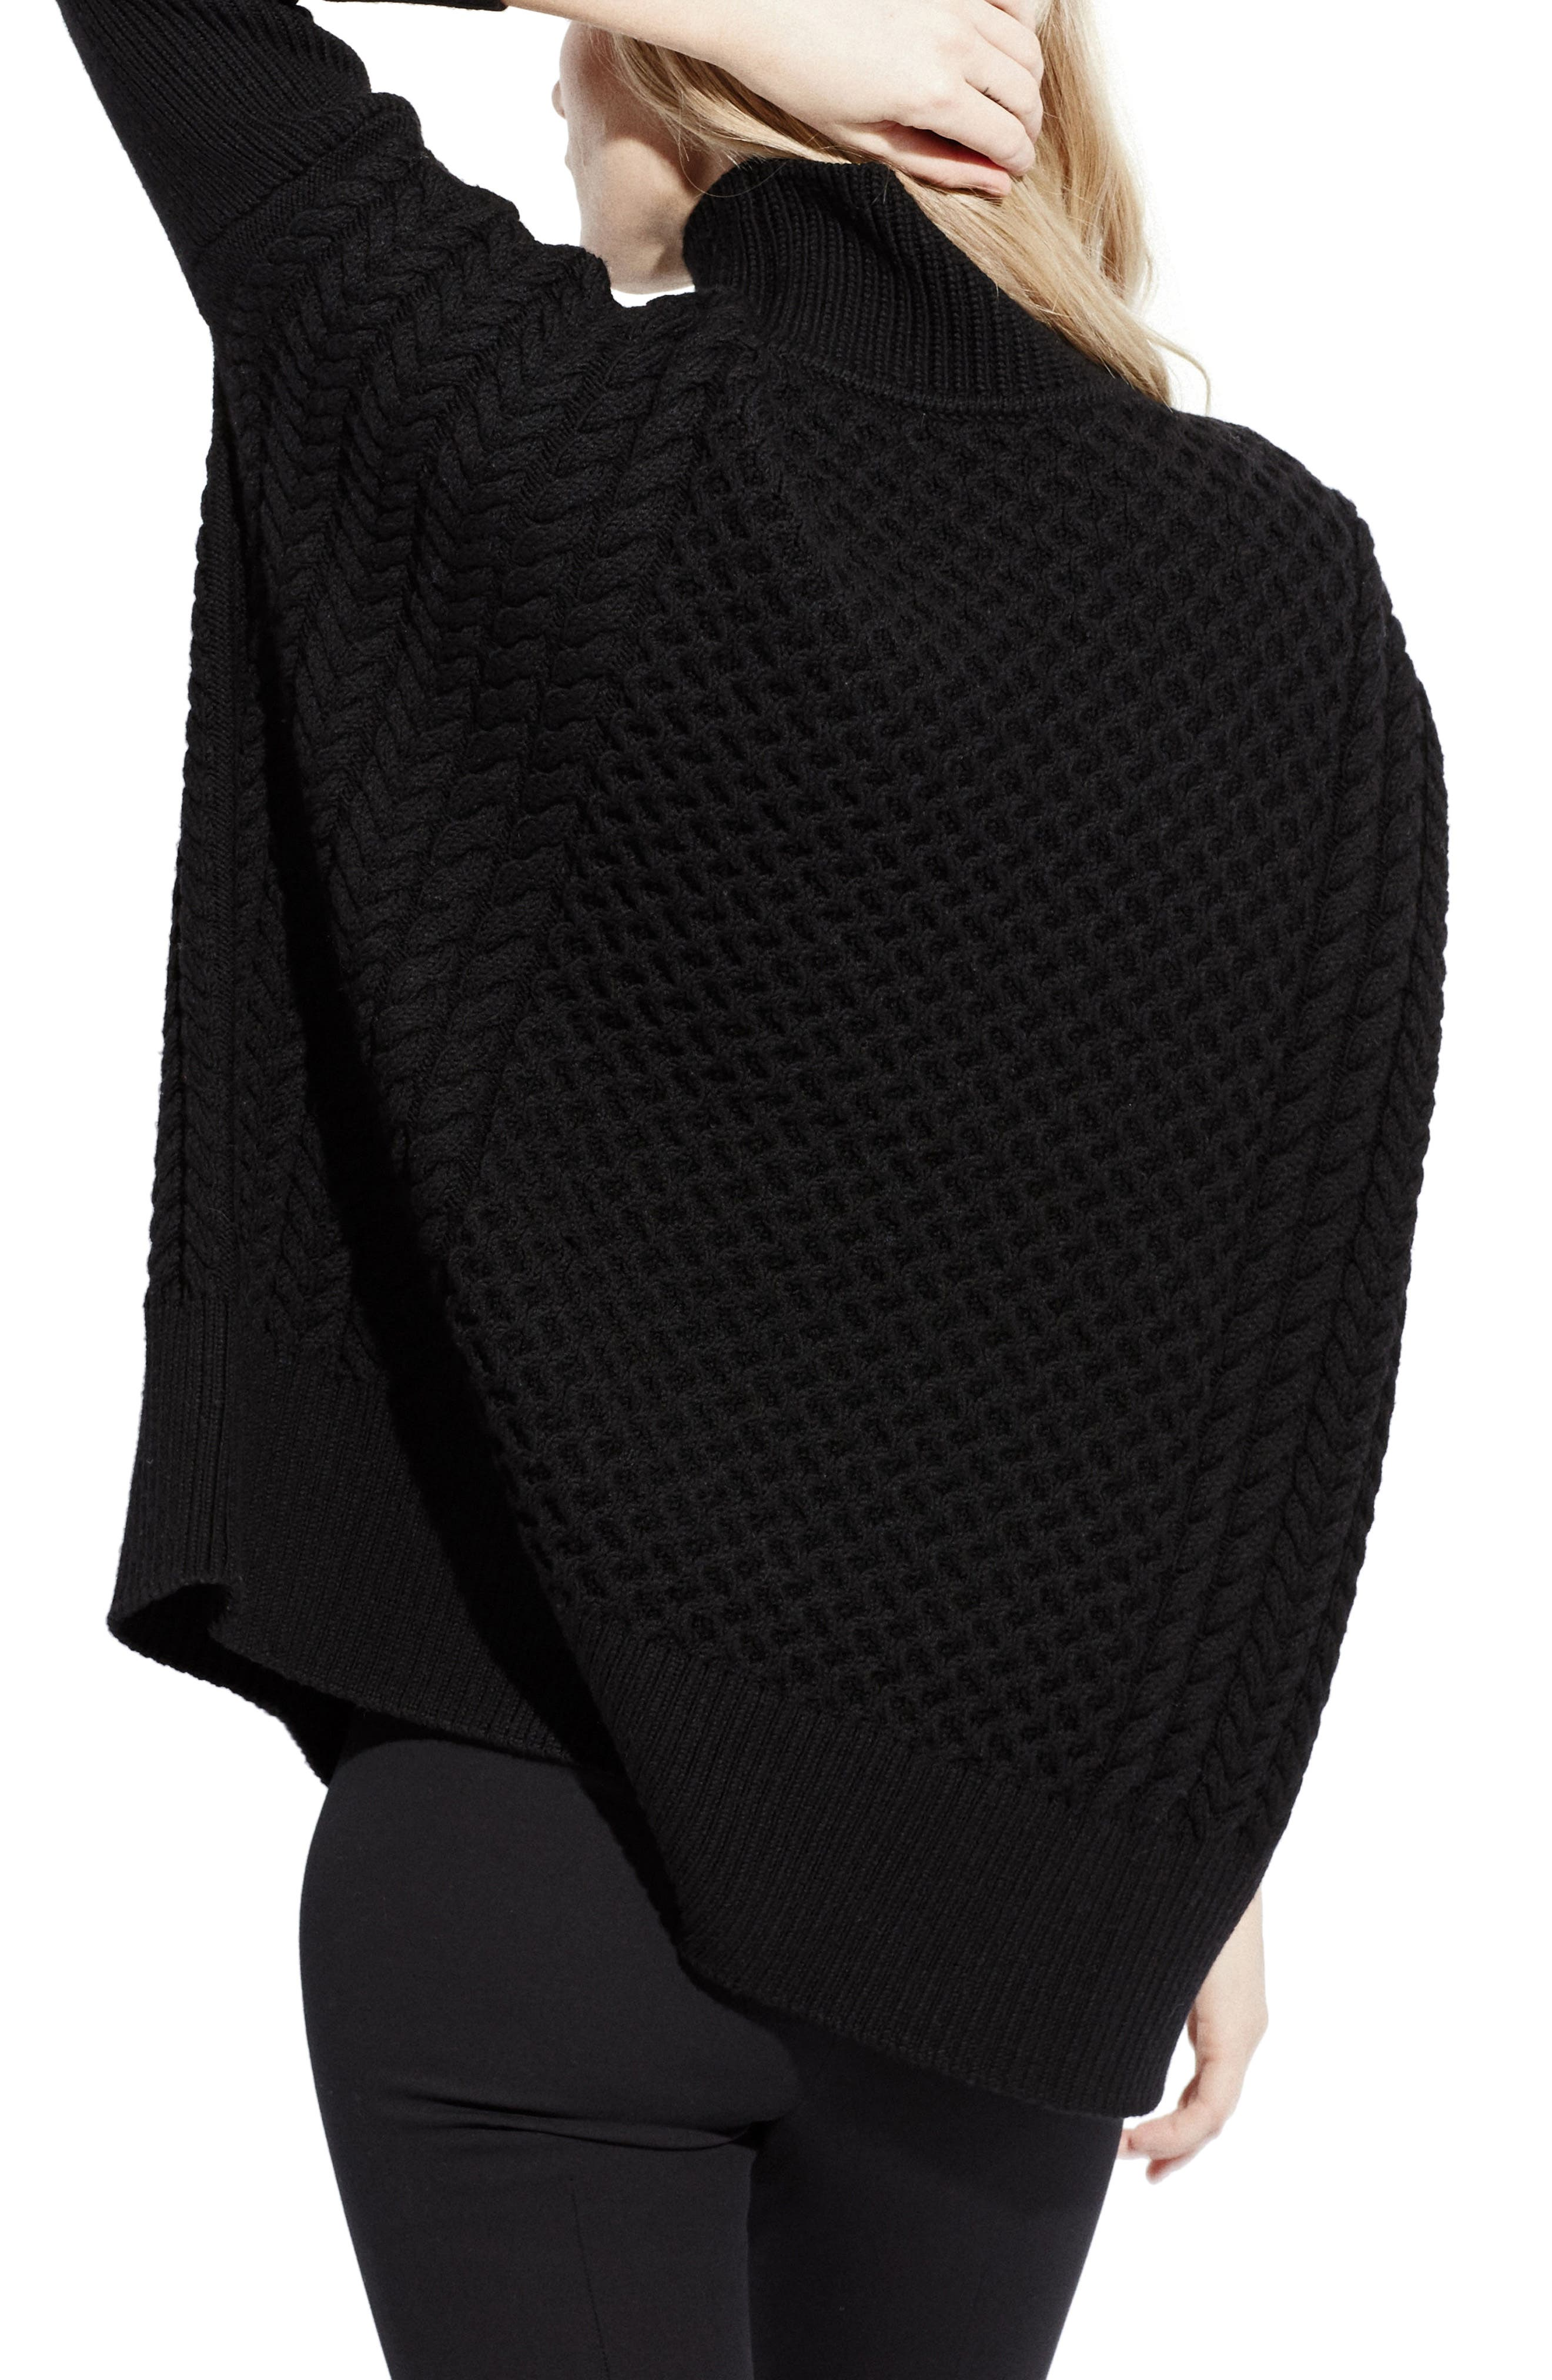 Le Square Turtleneck Sweater,                             Alternate thumbnail 2, color,                             001